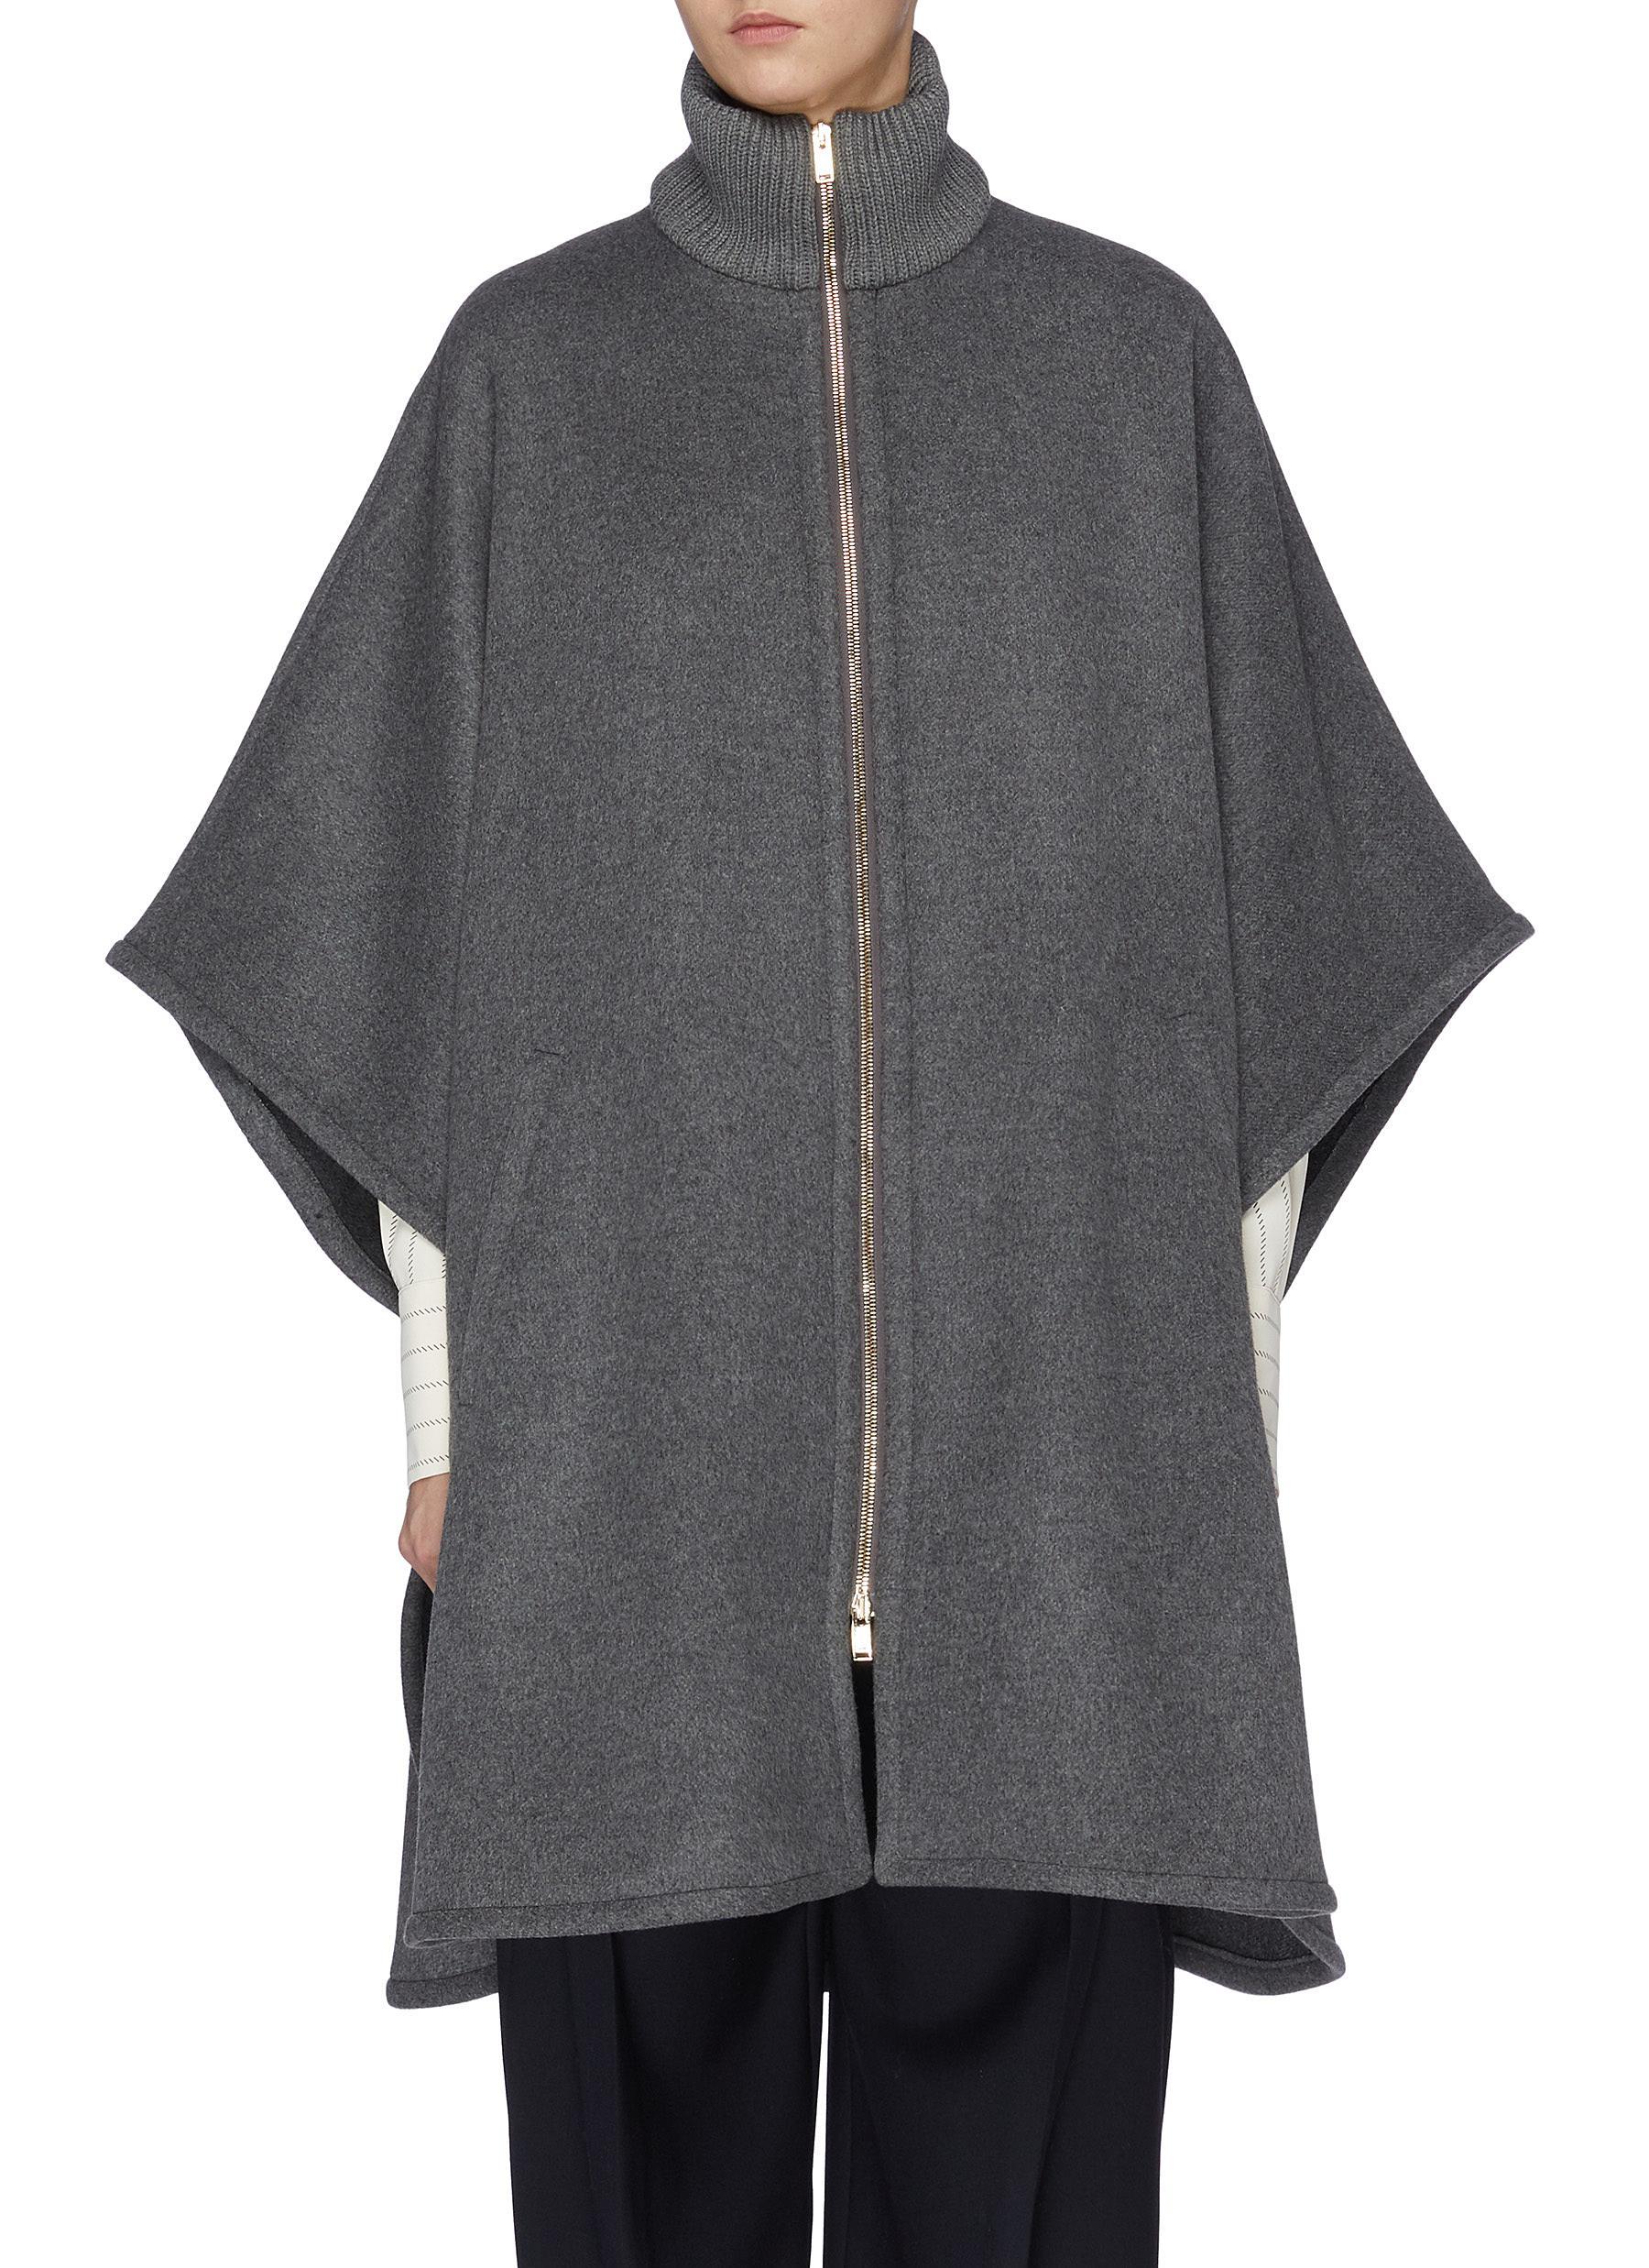 Caban wool turtleneck coat by Stella Mccartney